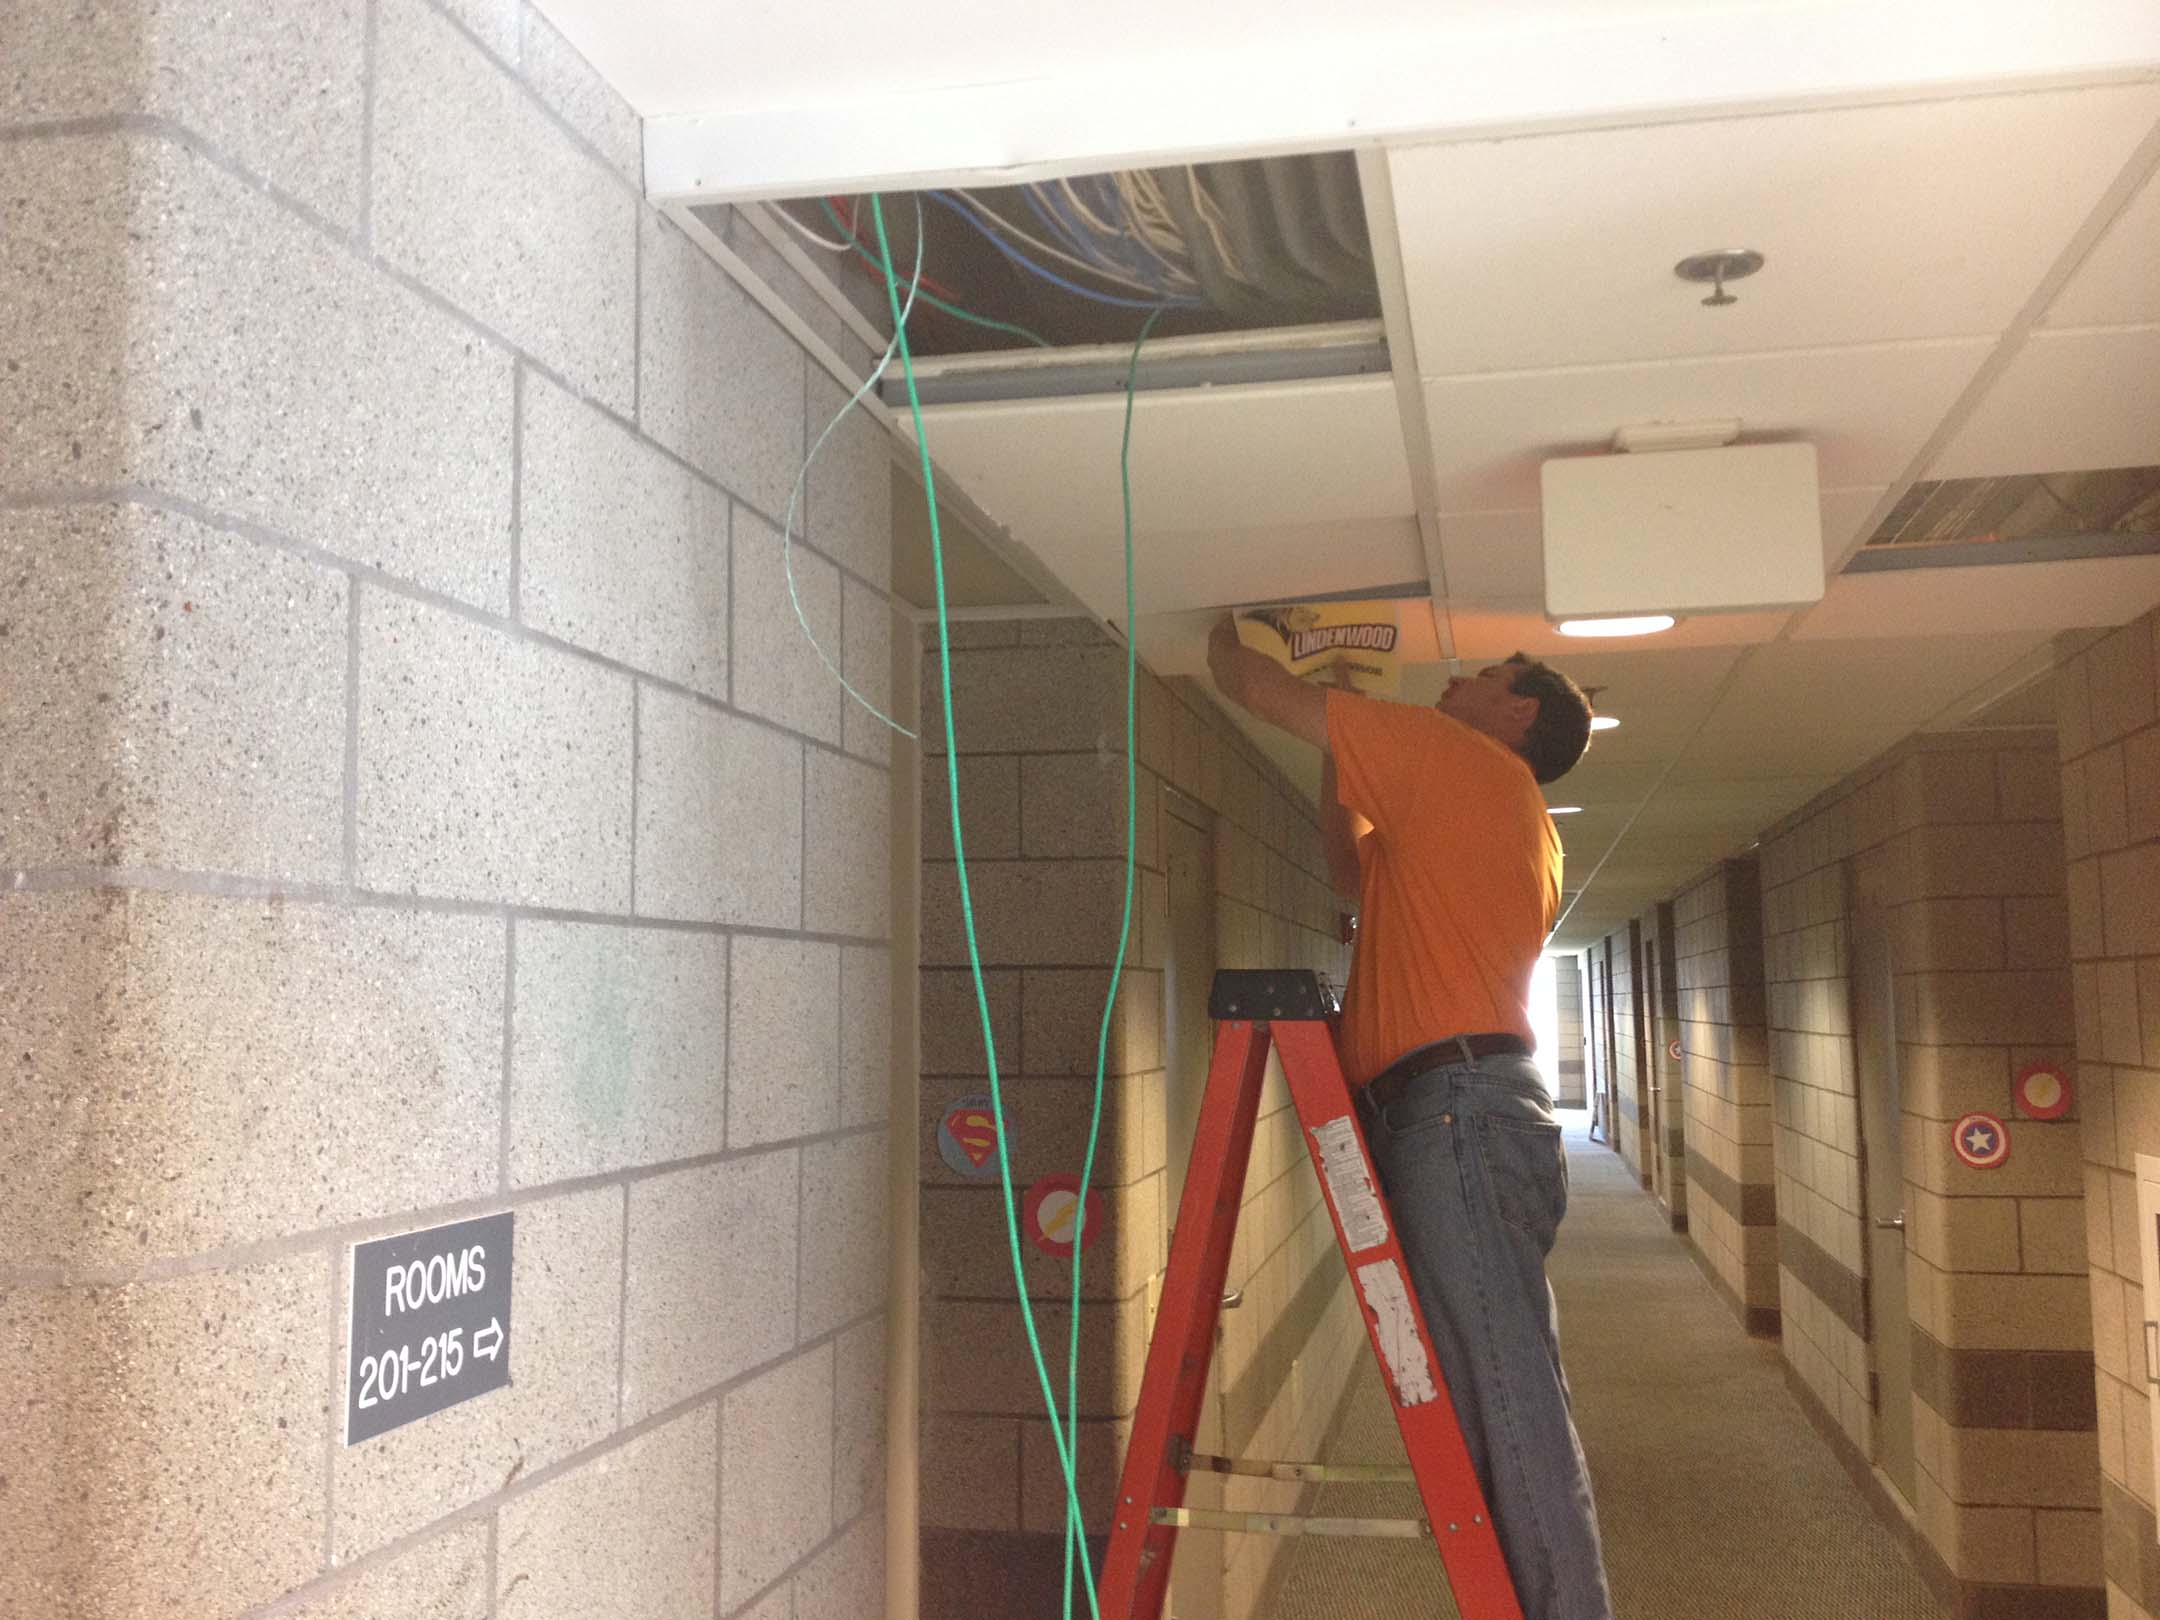 LU Maintenance installs new routers in Guffey Hall